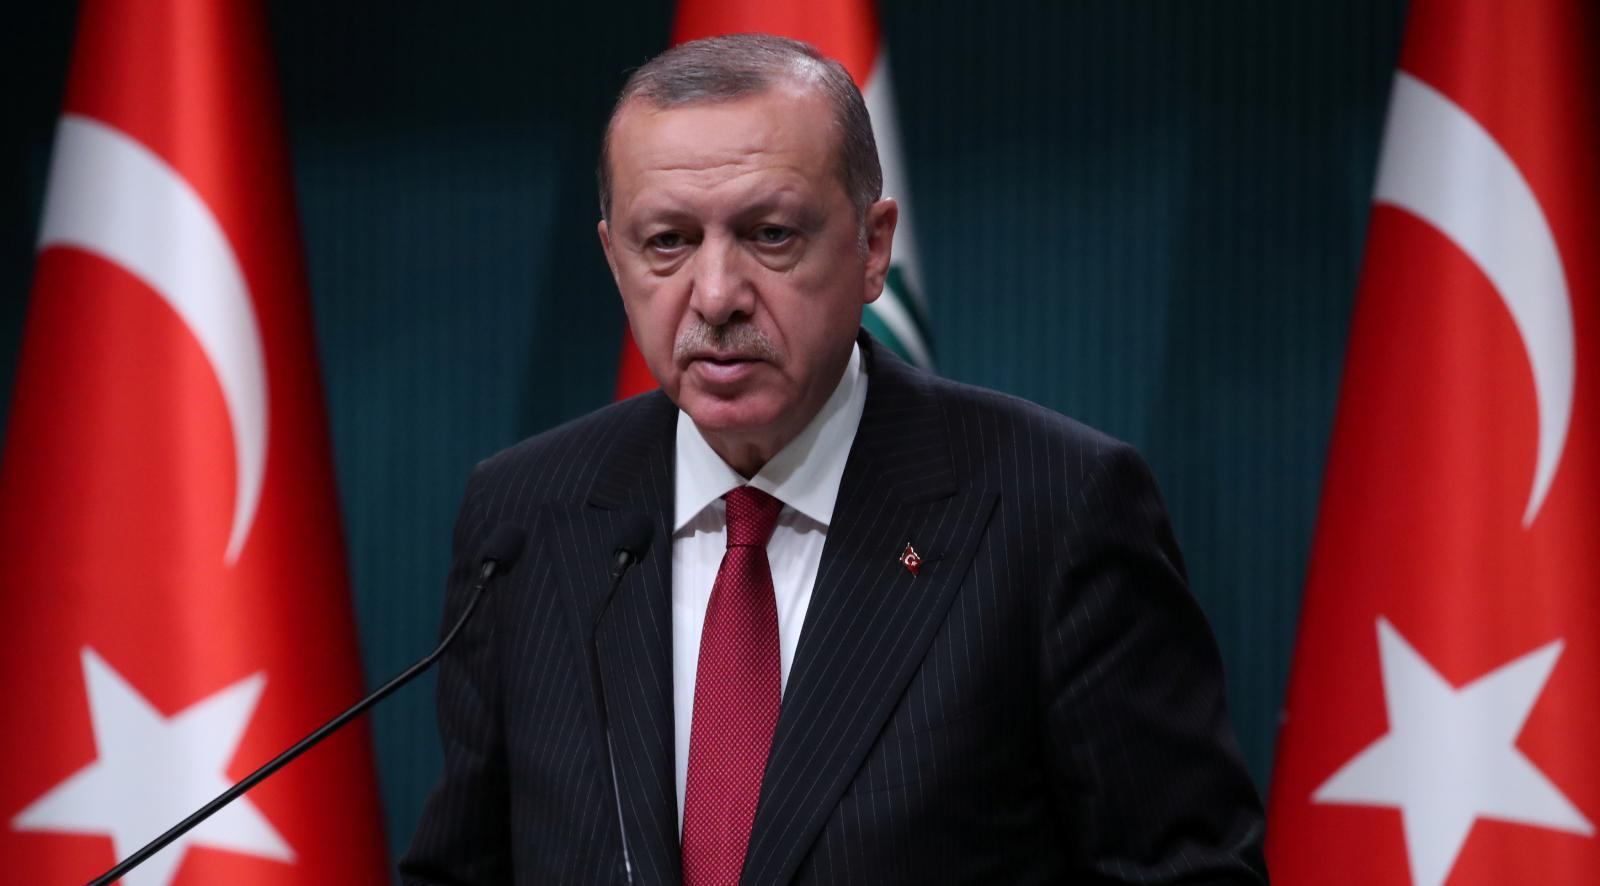 Turkish President Tayyip Erdogan